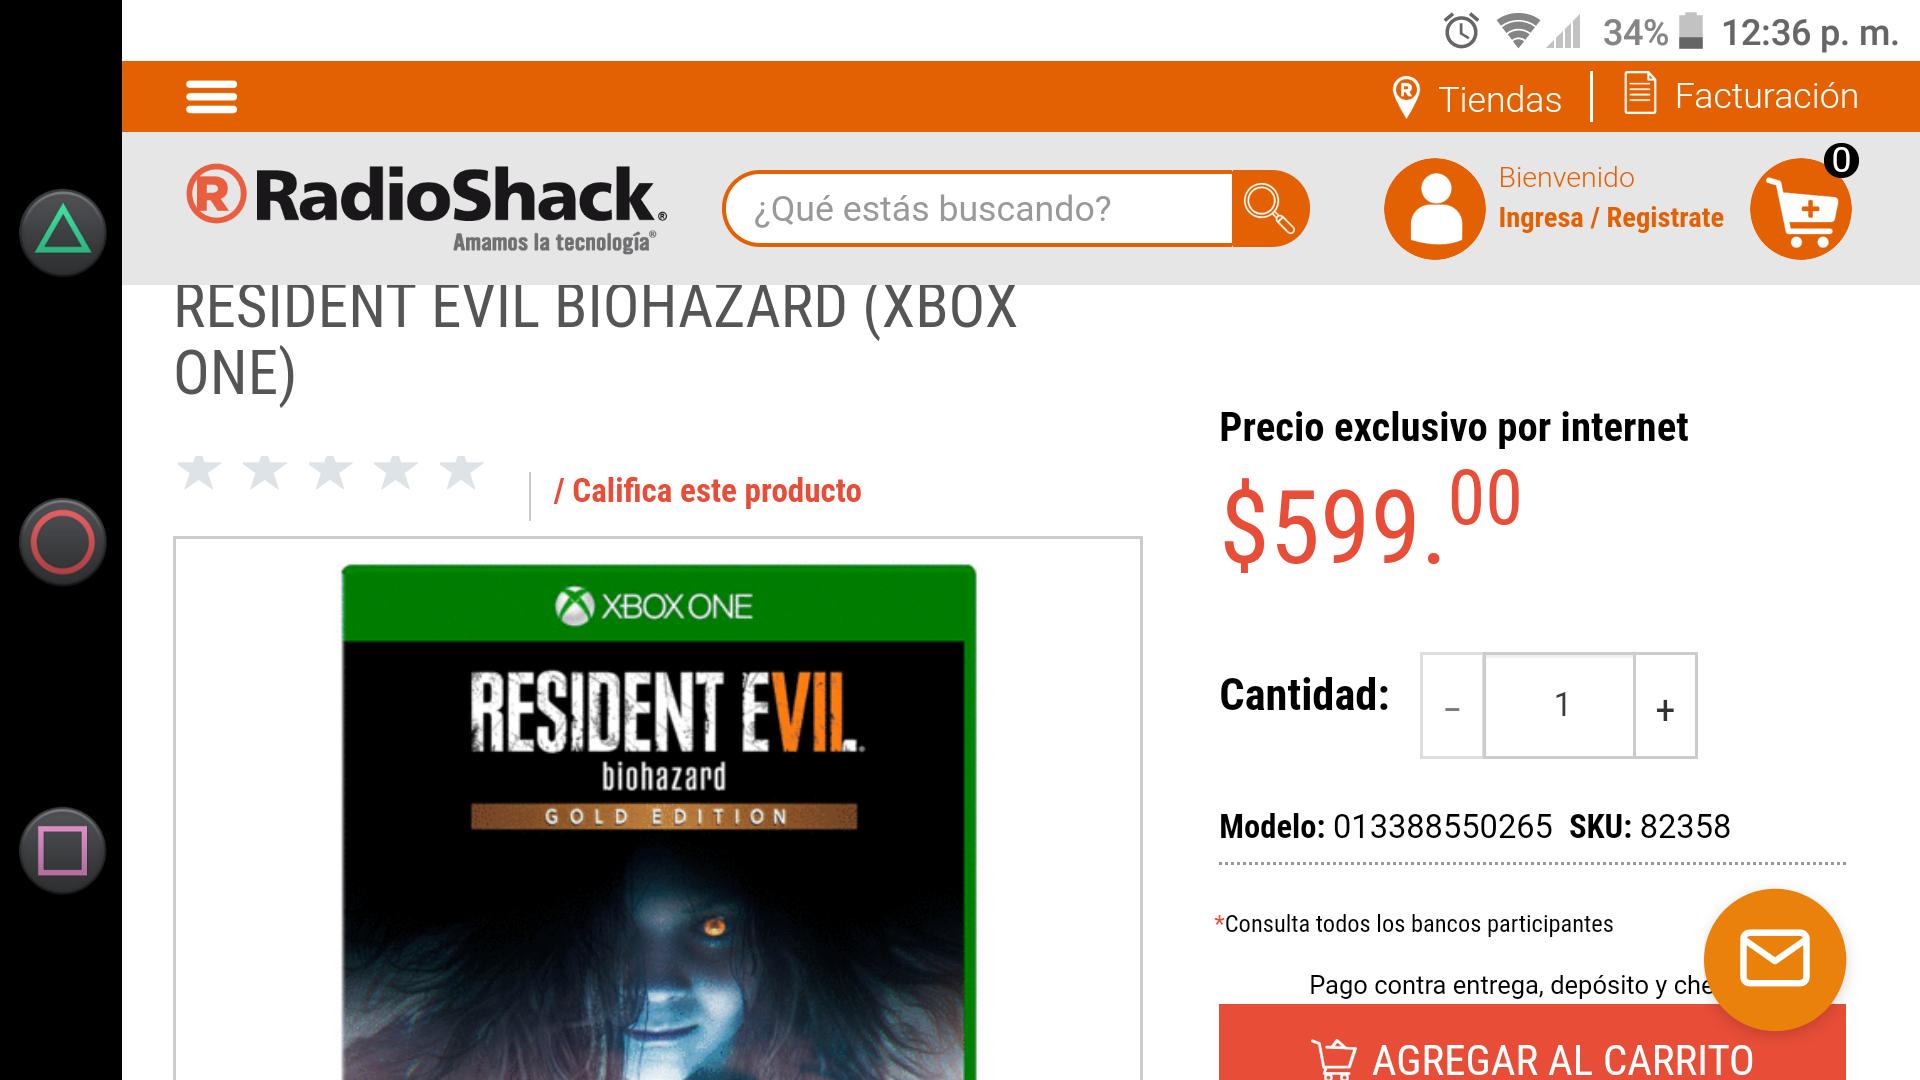 Radio Shack: Resident Evil 7 Biohazard Gold Edition Xbox One